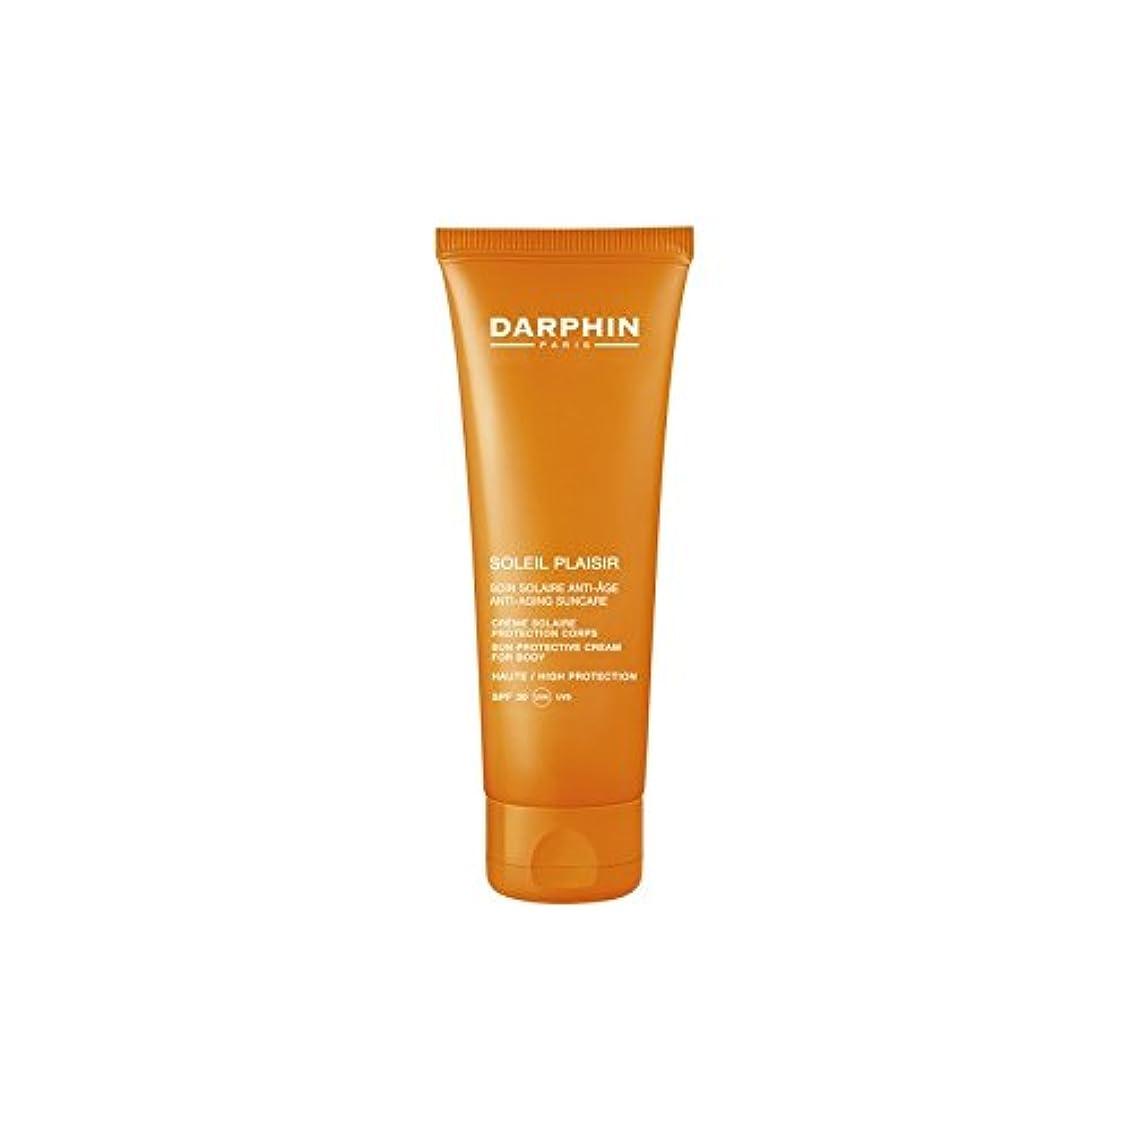 Darphin Soleil Plaisir Body Cream - ダルファンソレイユプレジールボディクリーム [並行輸入品]